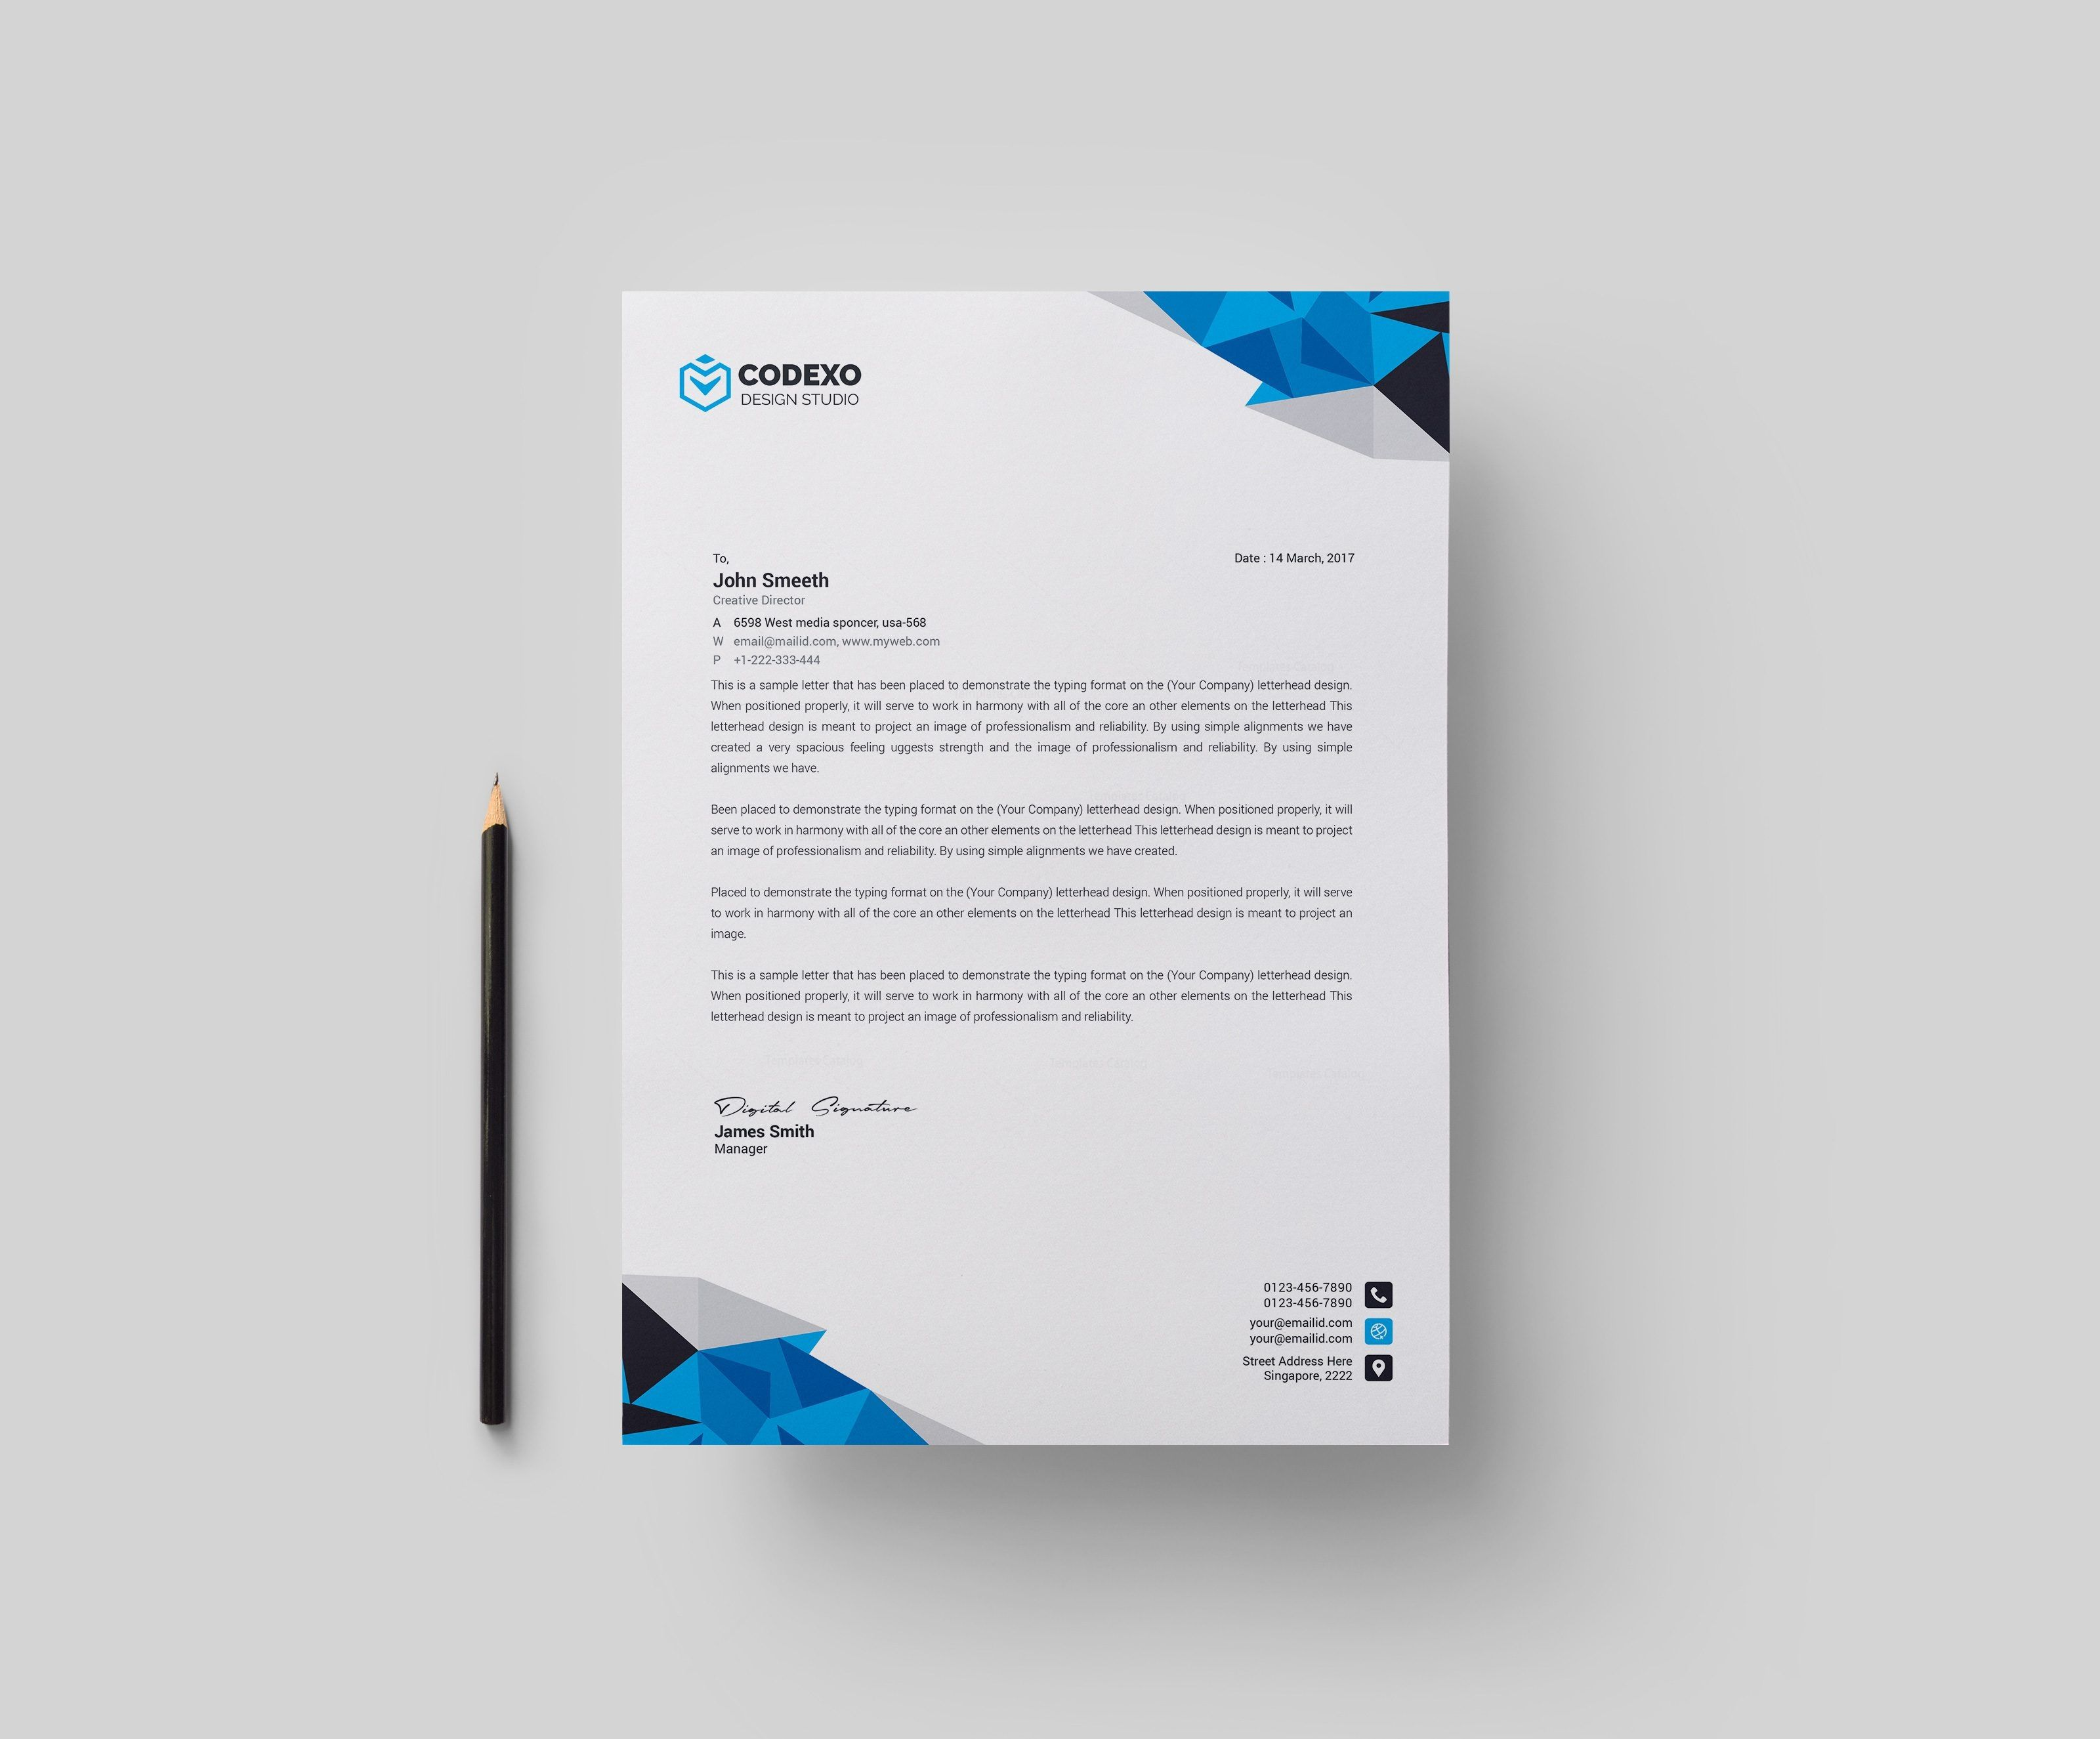 Diamond Professional Corporate Letterhead Template 000904 Template Catalog Company Letterhead Template Professional Letterhead Template Business Letter Template